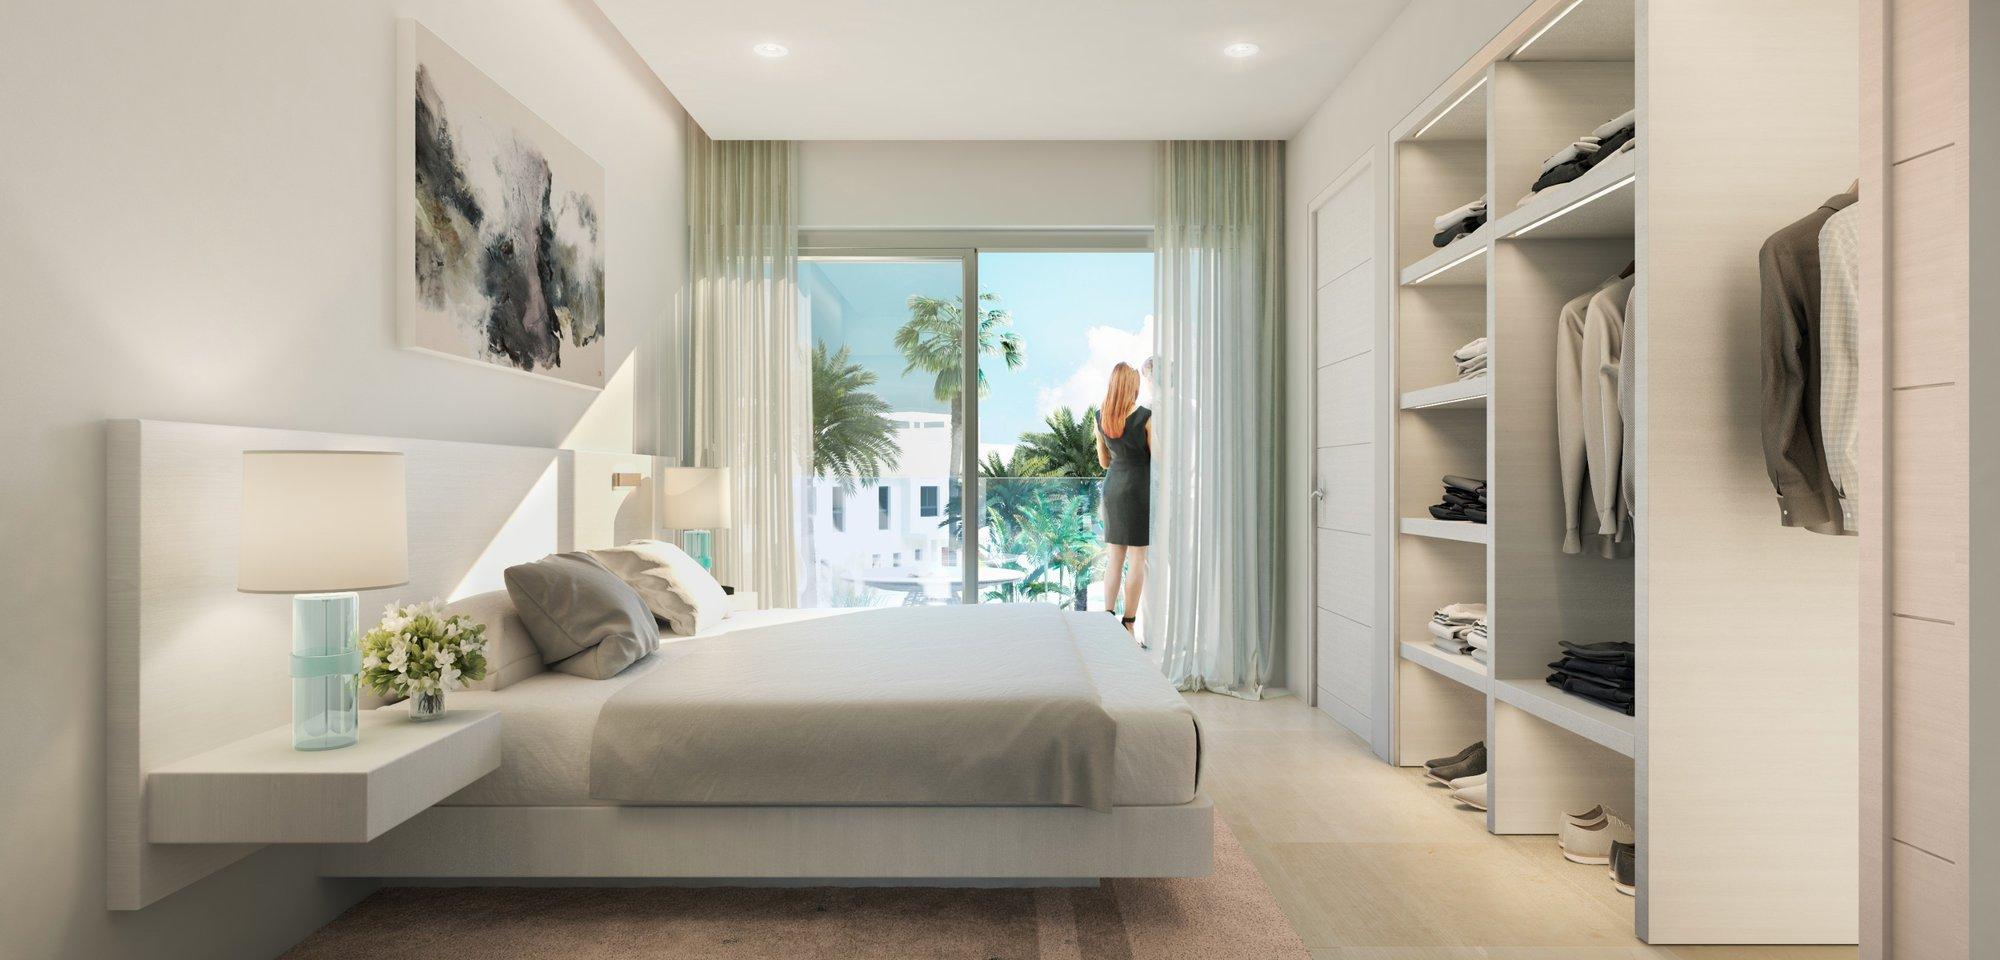 3 bedroom, 2 bathroom townhouse for sale in calahonda, mijas - mas